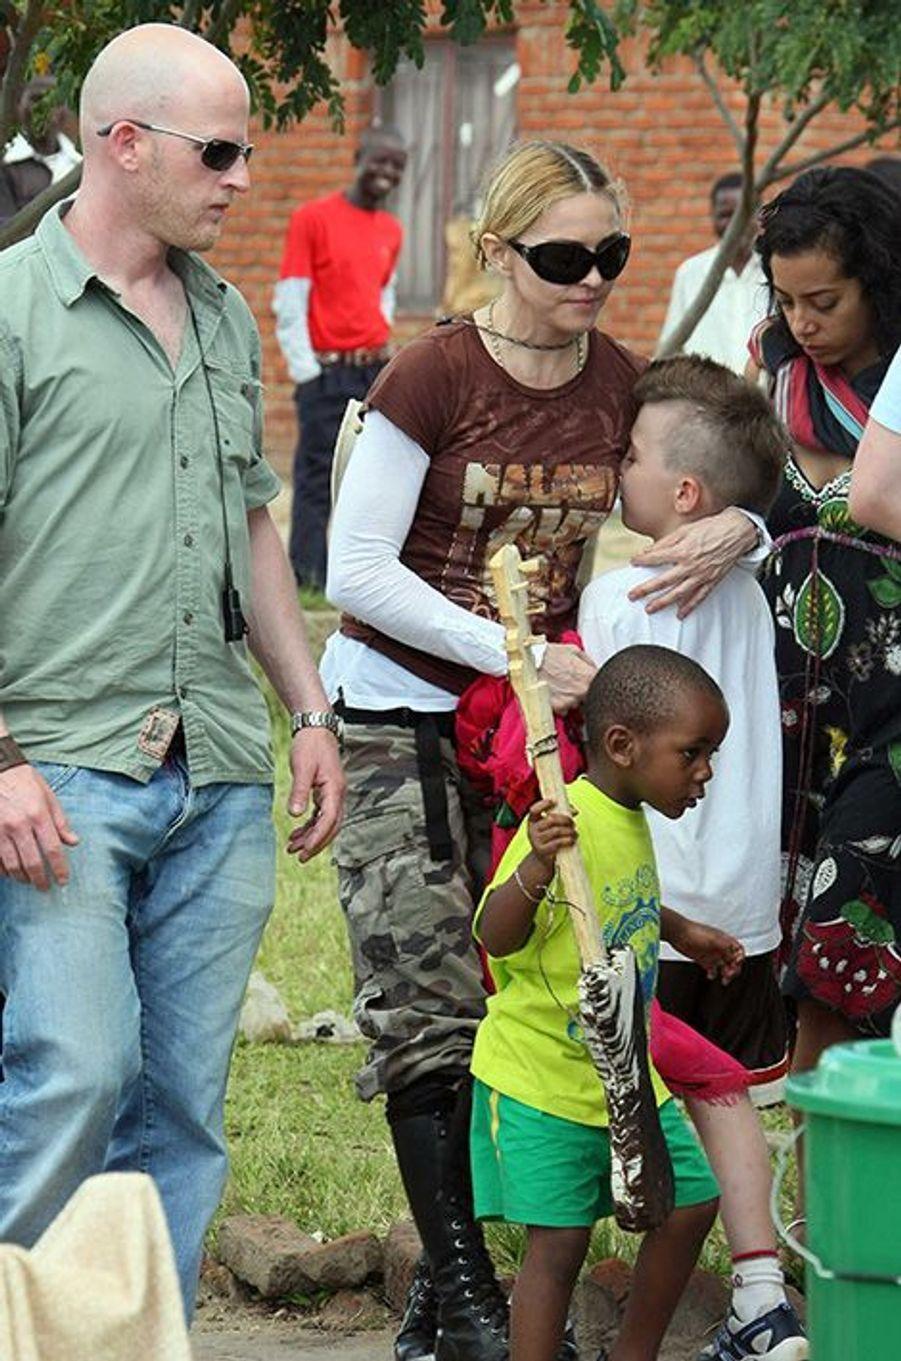 Madonna et Rocco en 2009